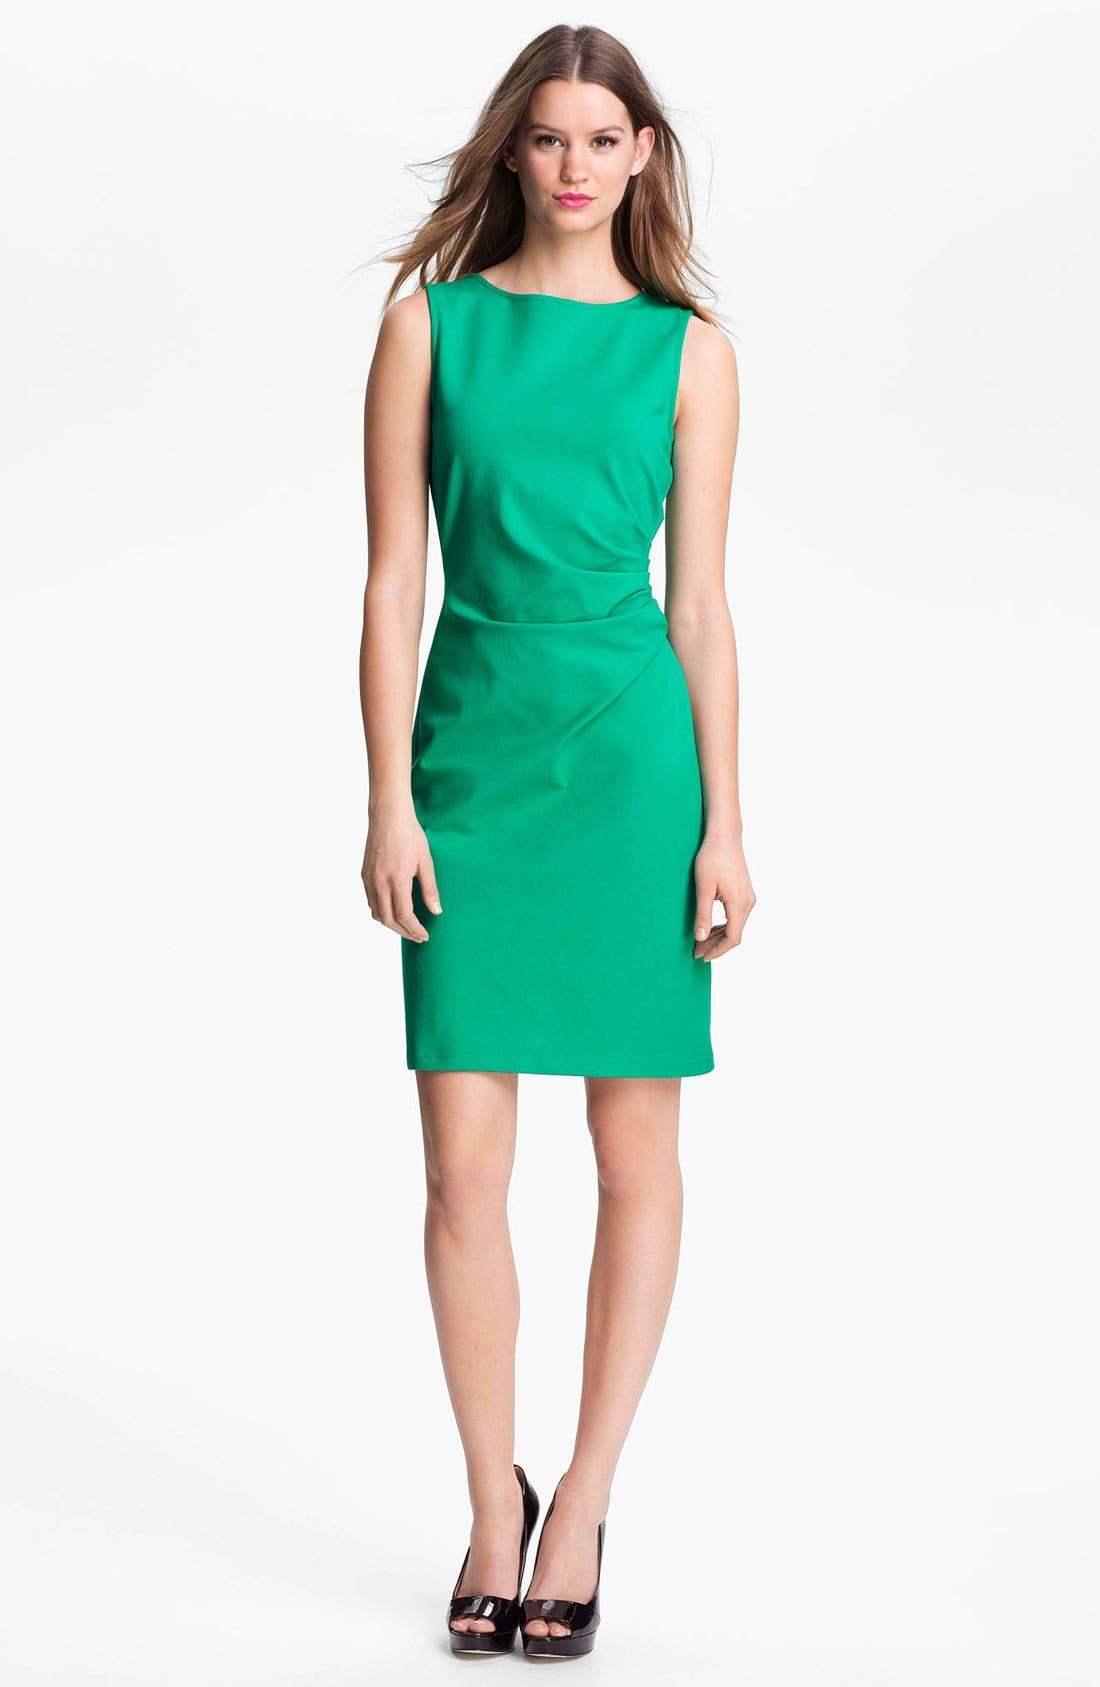 Alternate Image 1 Selected - Kenneth Cole New York 'Hilary' Dress